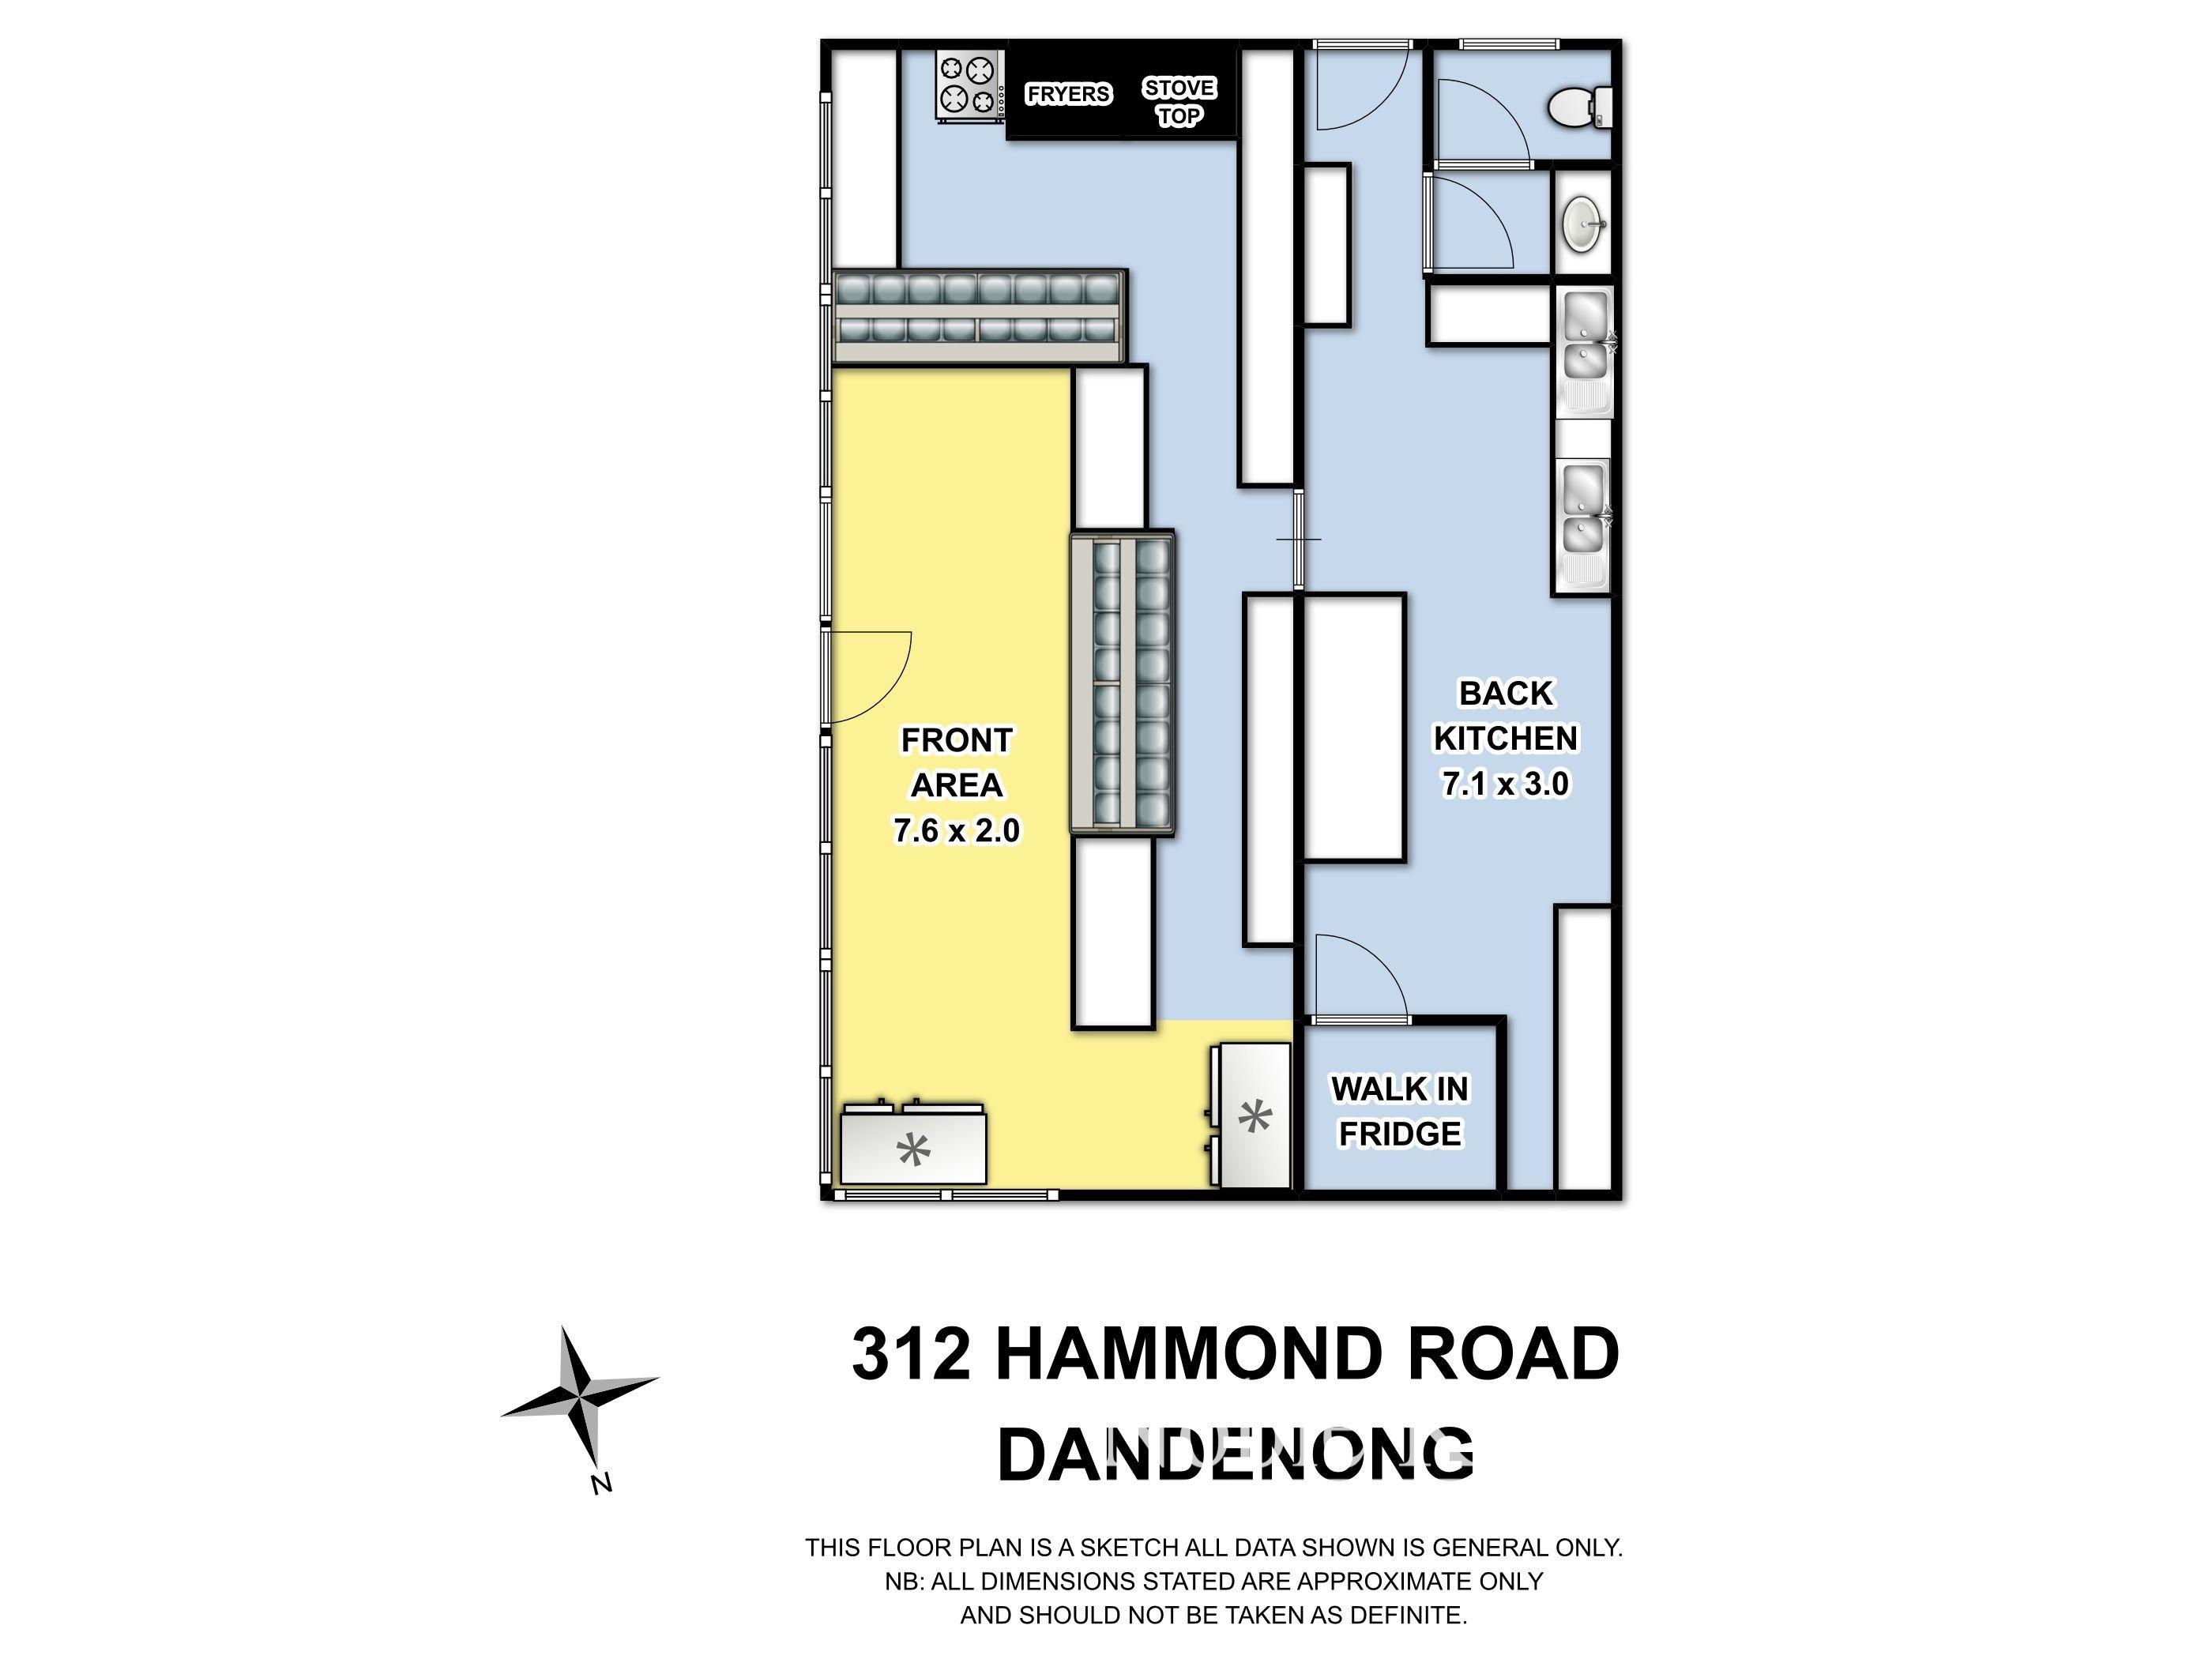 312 Hammond Road Dandenong